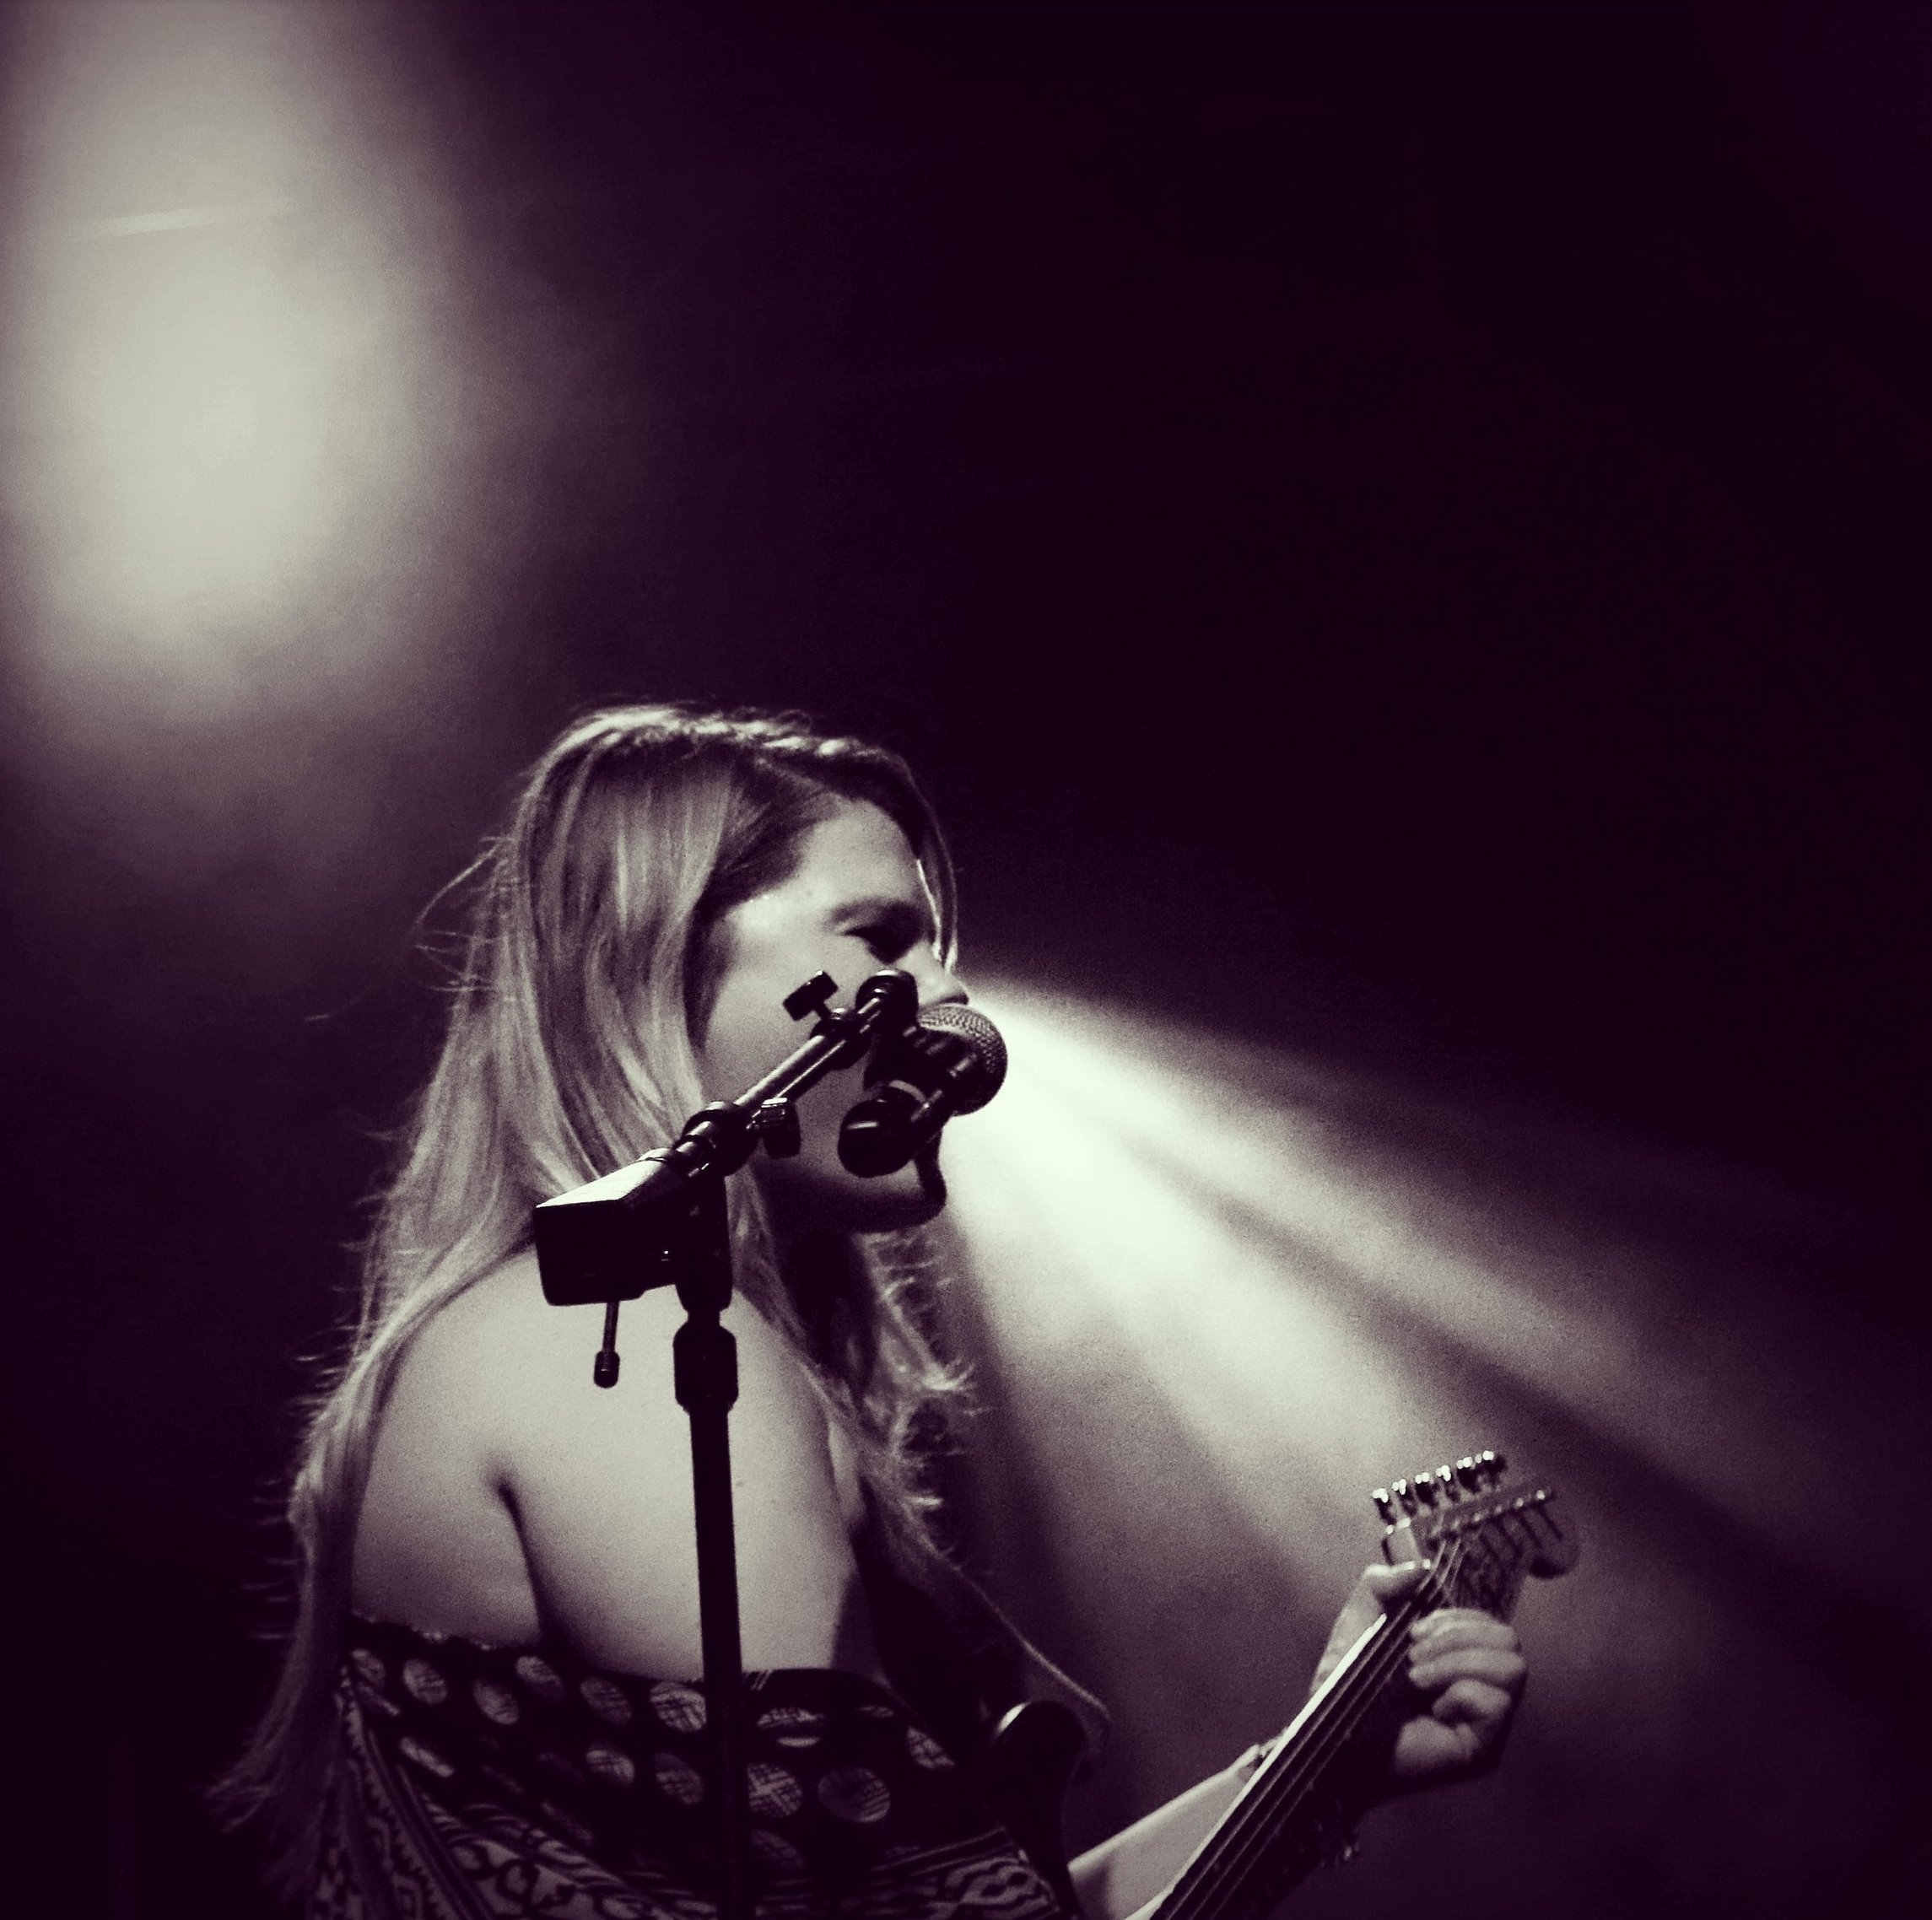 Photo by Missy Schultz Faulkner